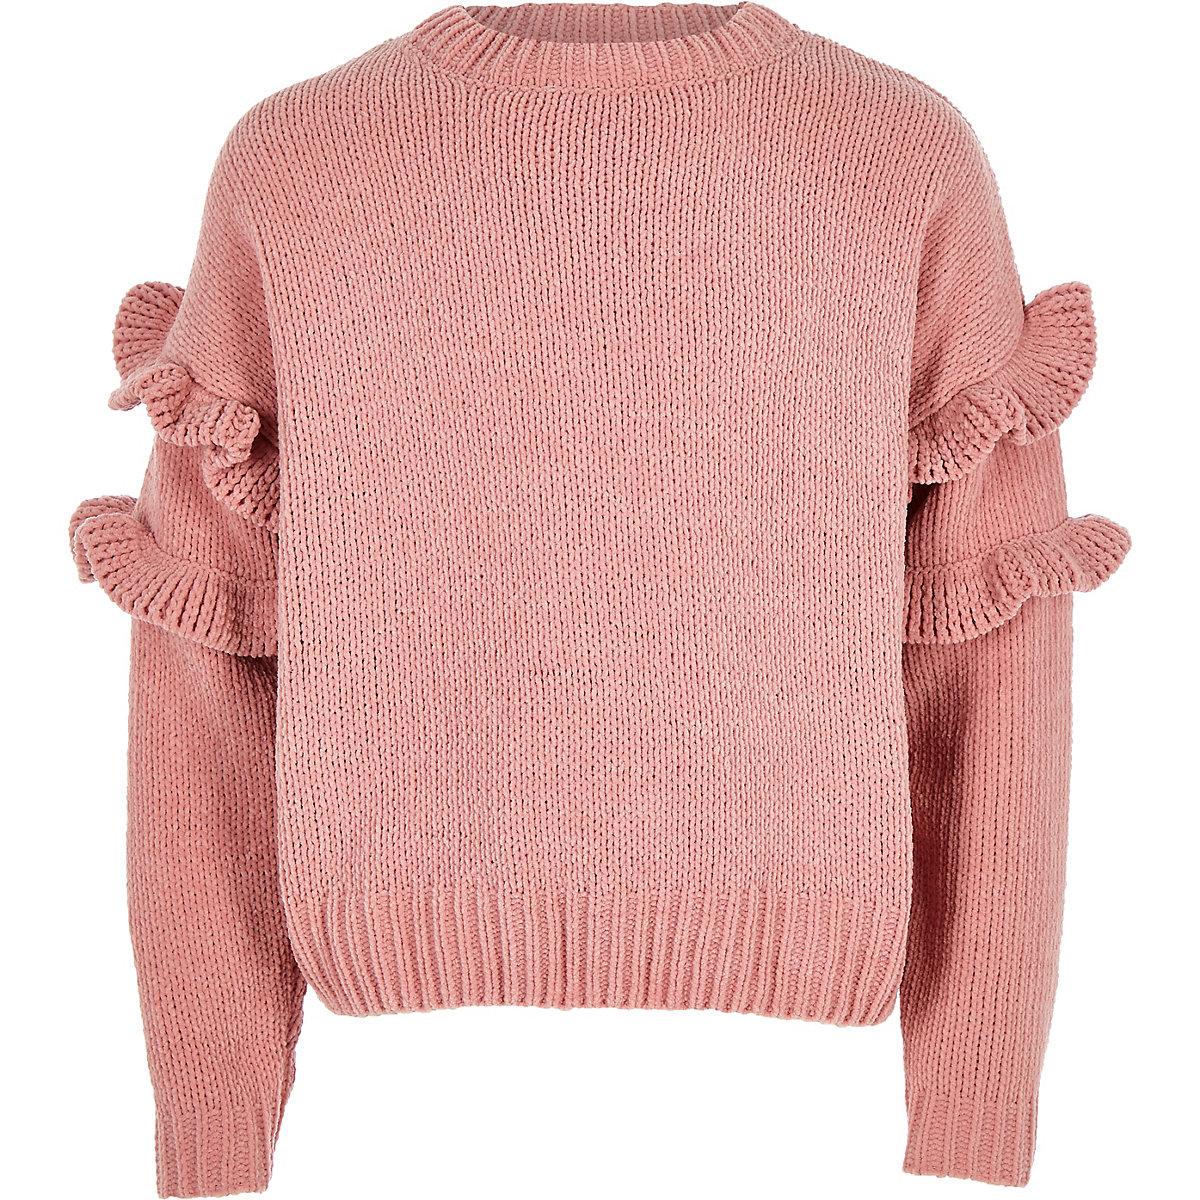 Girls pink frill chenille knit jumper